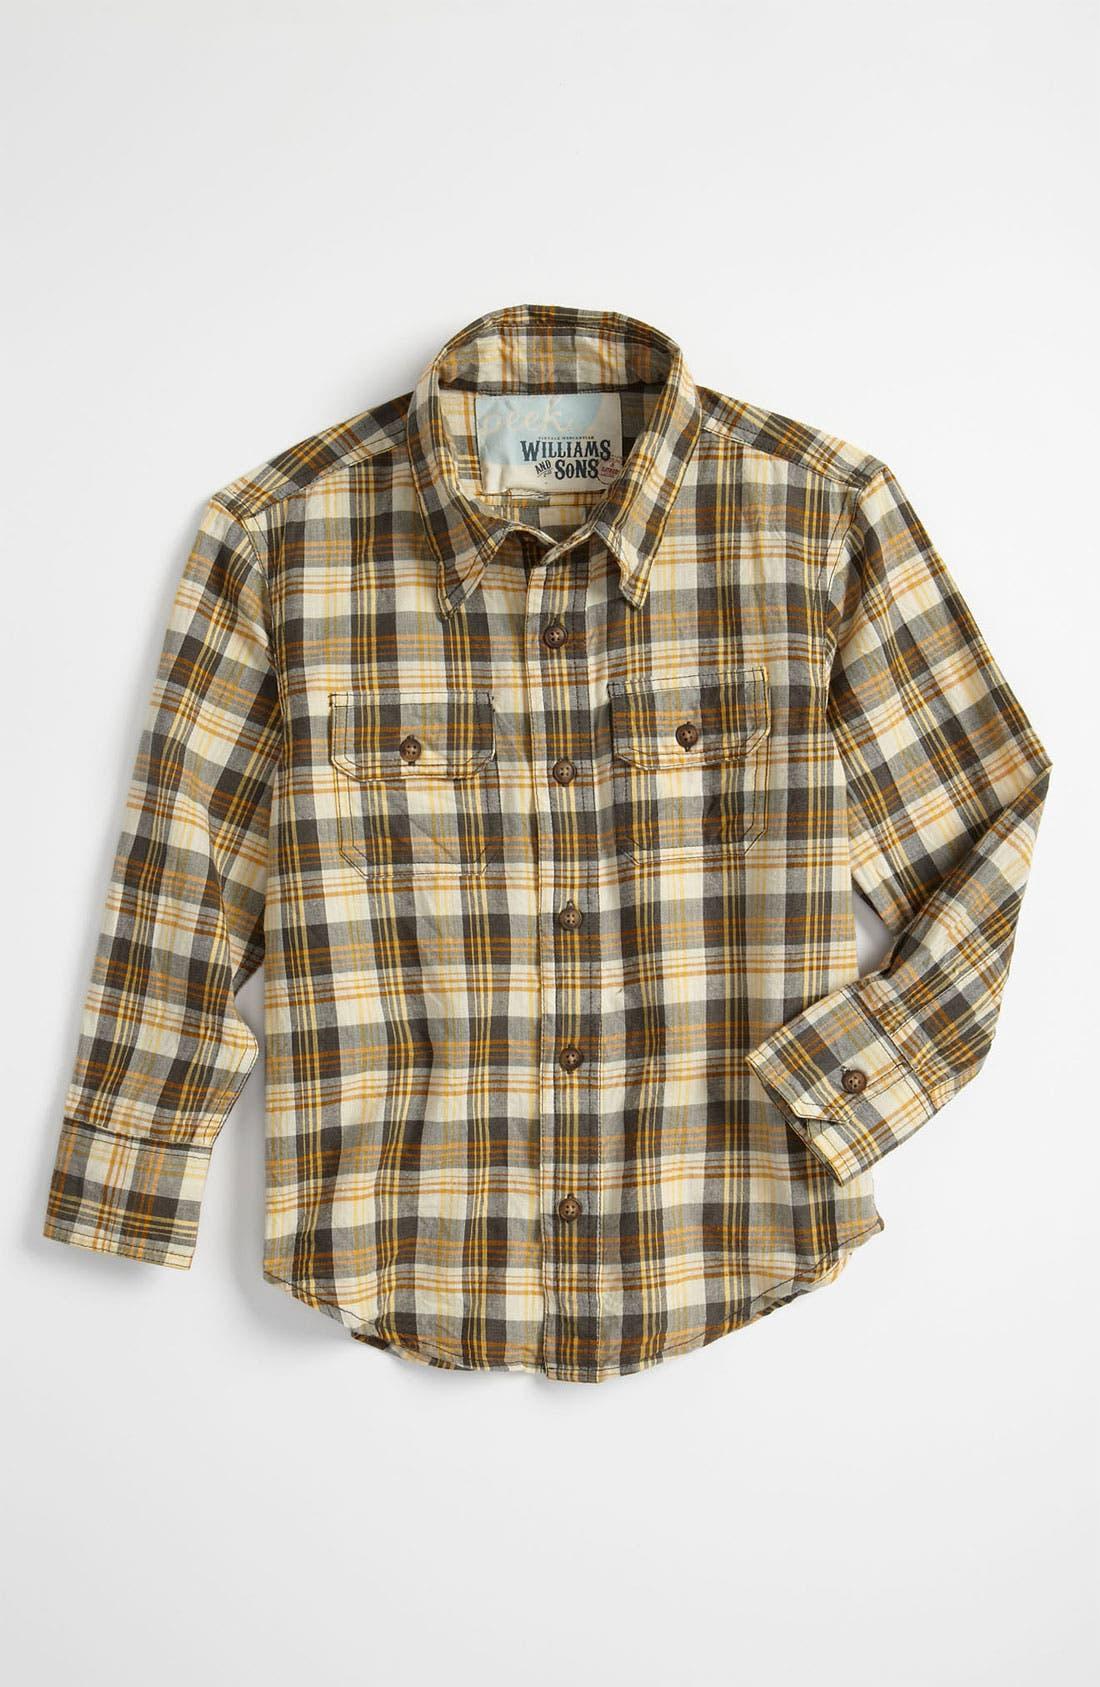 Alternate Image 1 Selected - Peek 'Brooks' Plaid Shirt (Toddler, Little Boys & Big Boys)